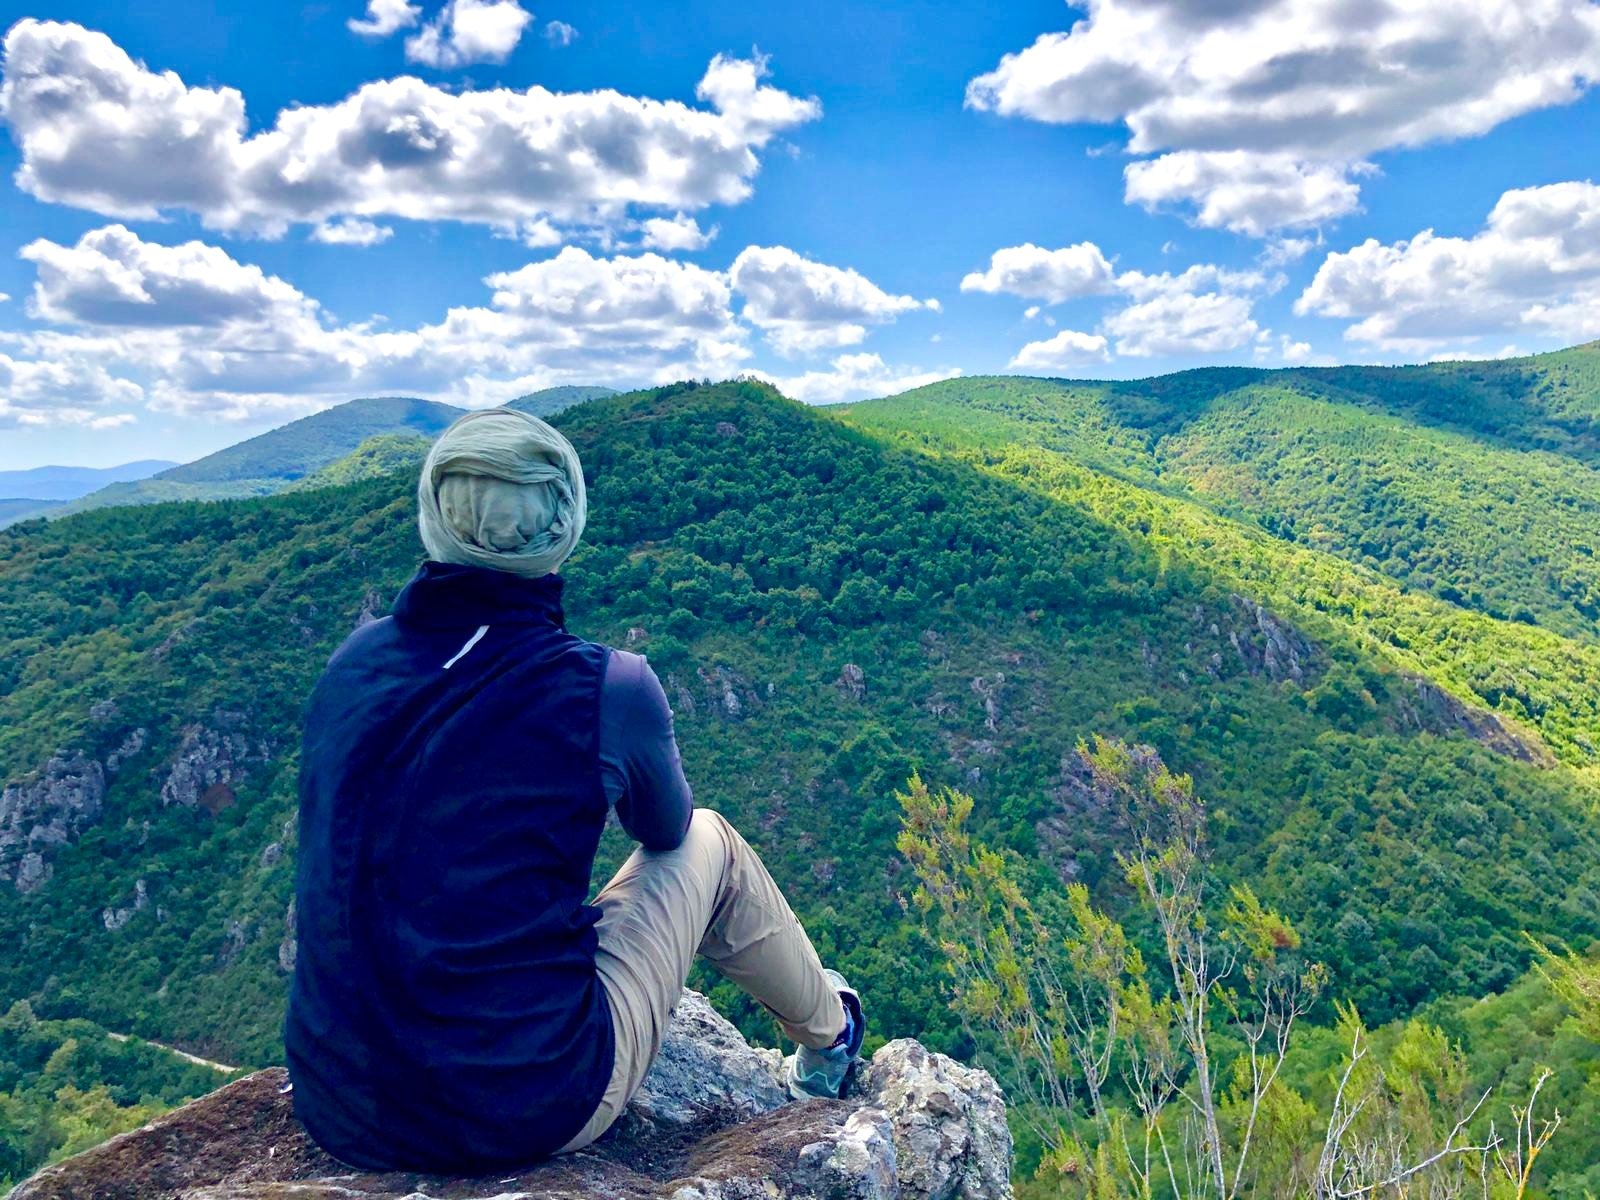 Expat Linda Hyökki enjoys the view after a rewarding hike in Derince, Kocaeli. (Photo courtesy of Linda Hyökki)